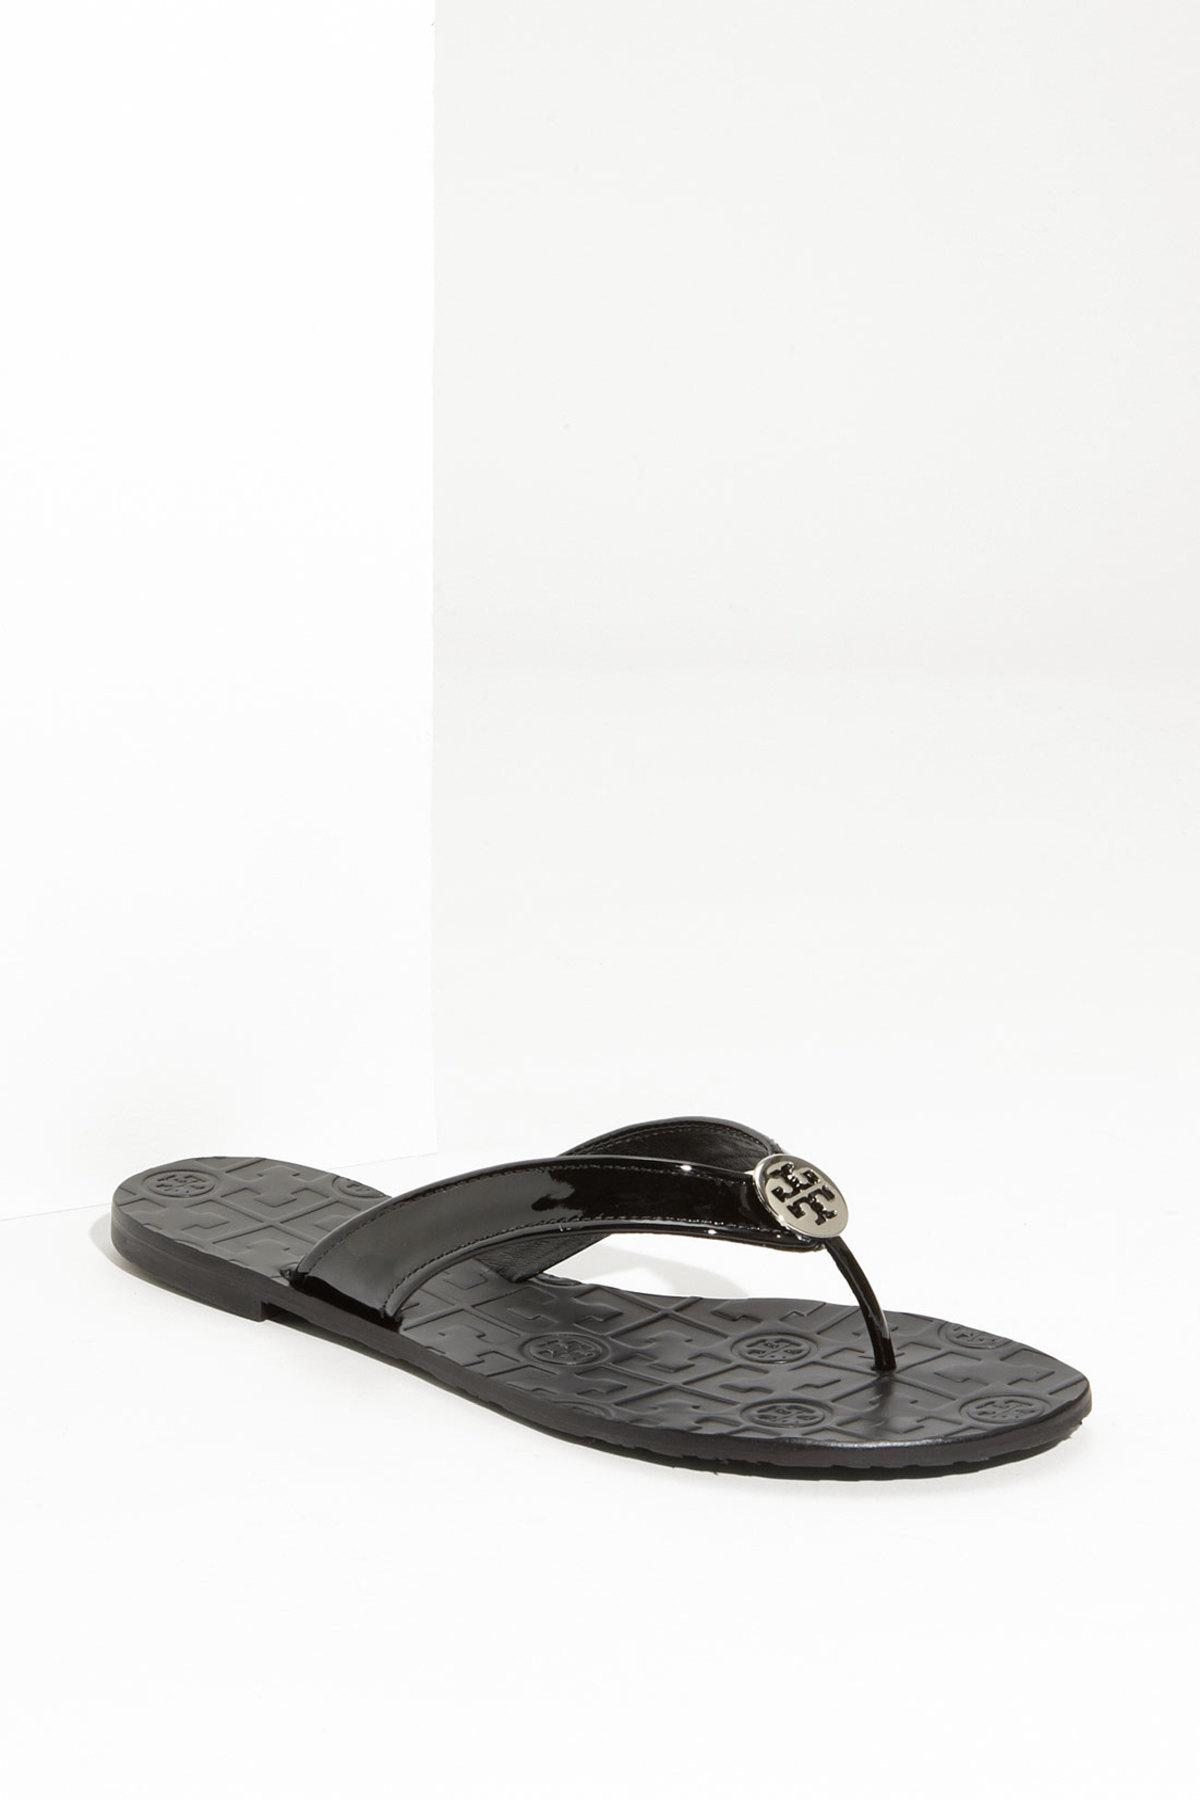 6f6c6e937a29 Lyst - Tory Burch Thora Thong Sandal in Black